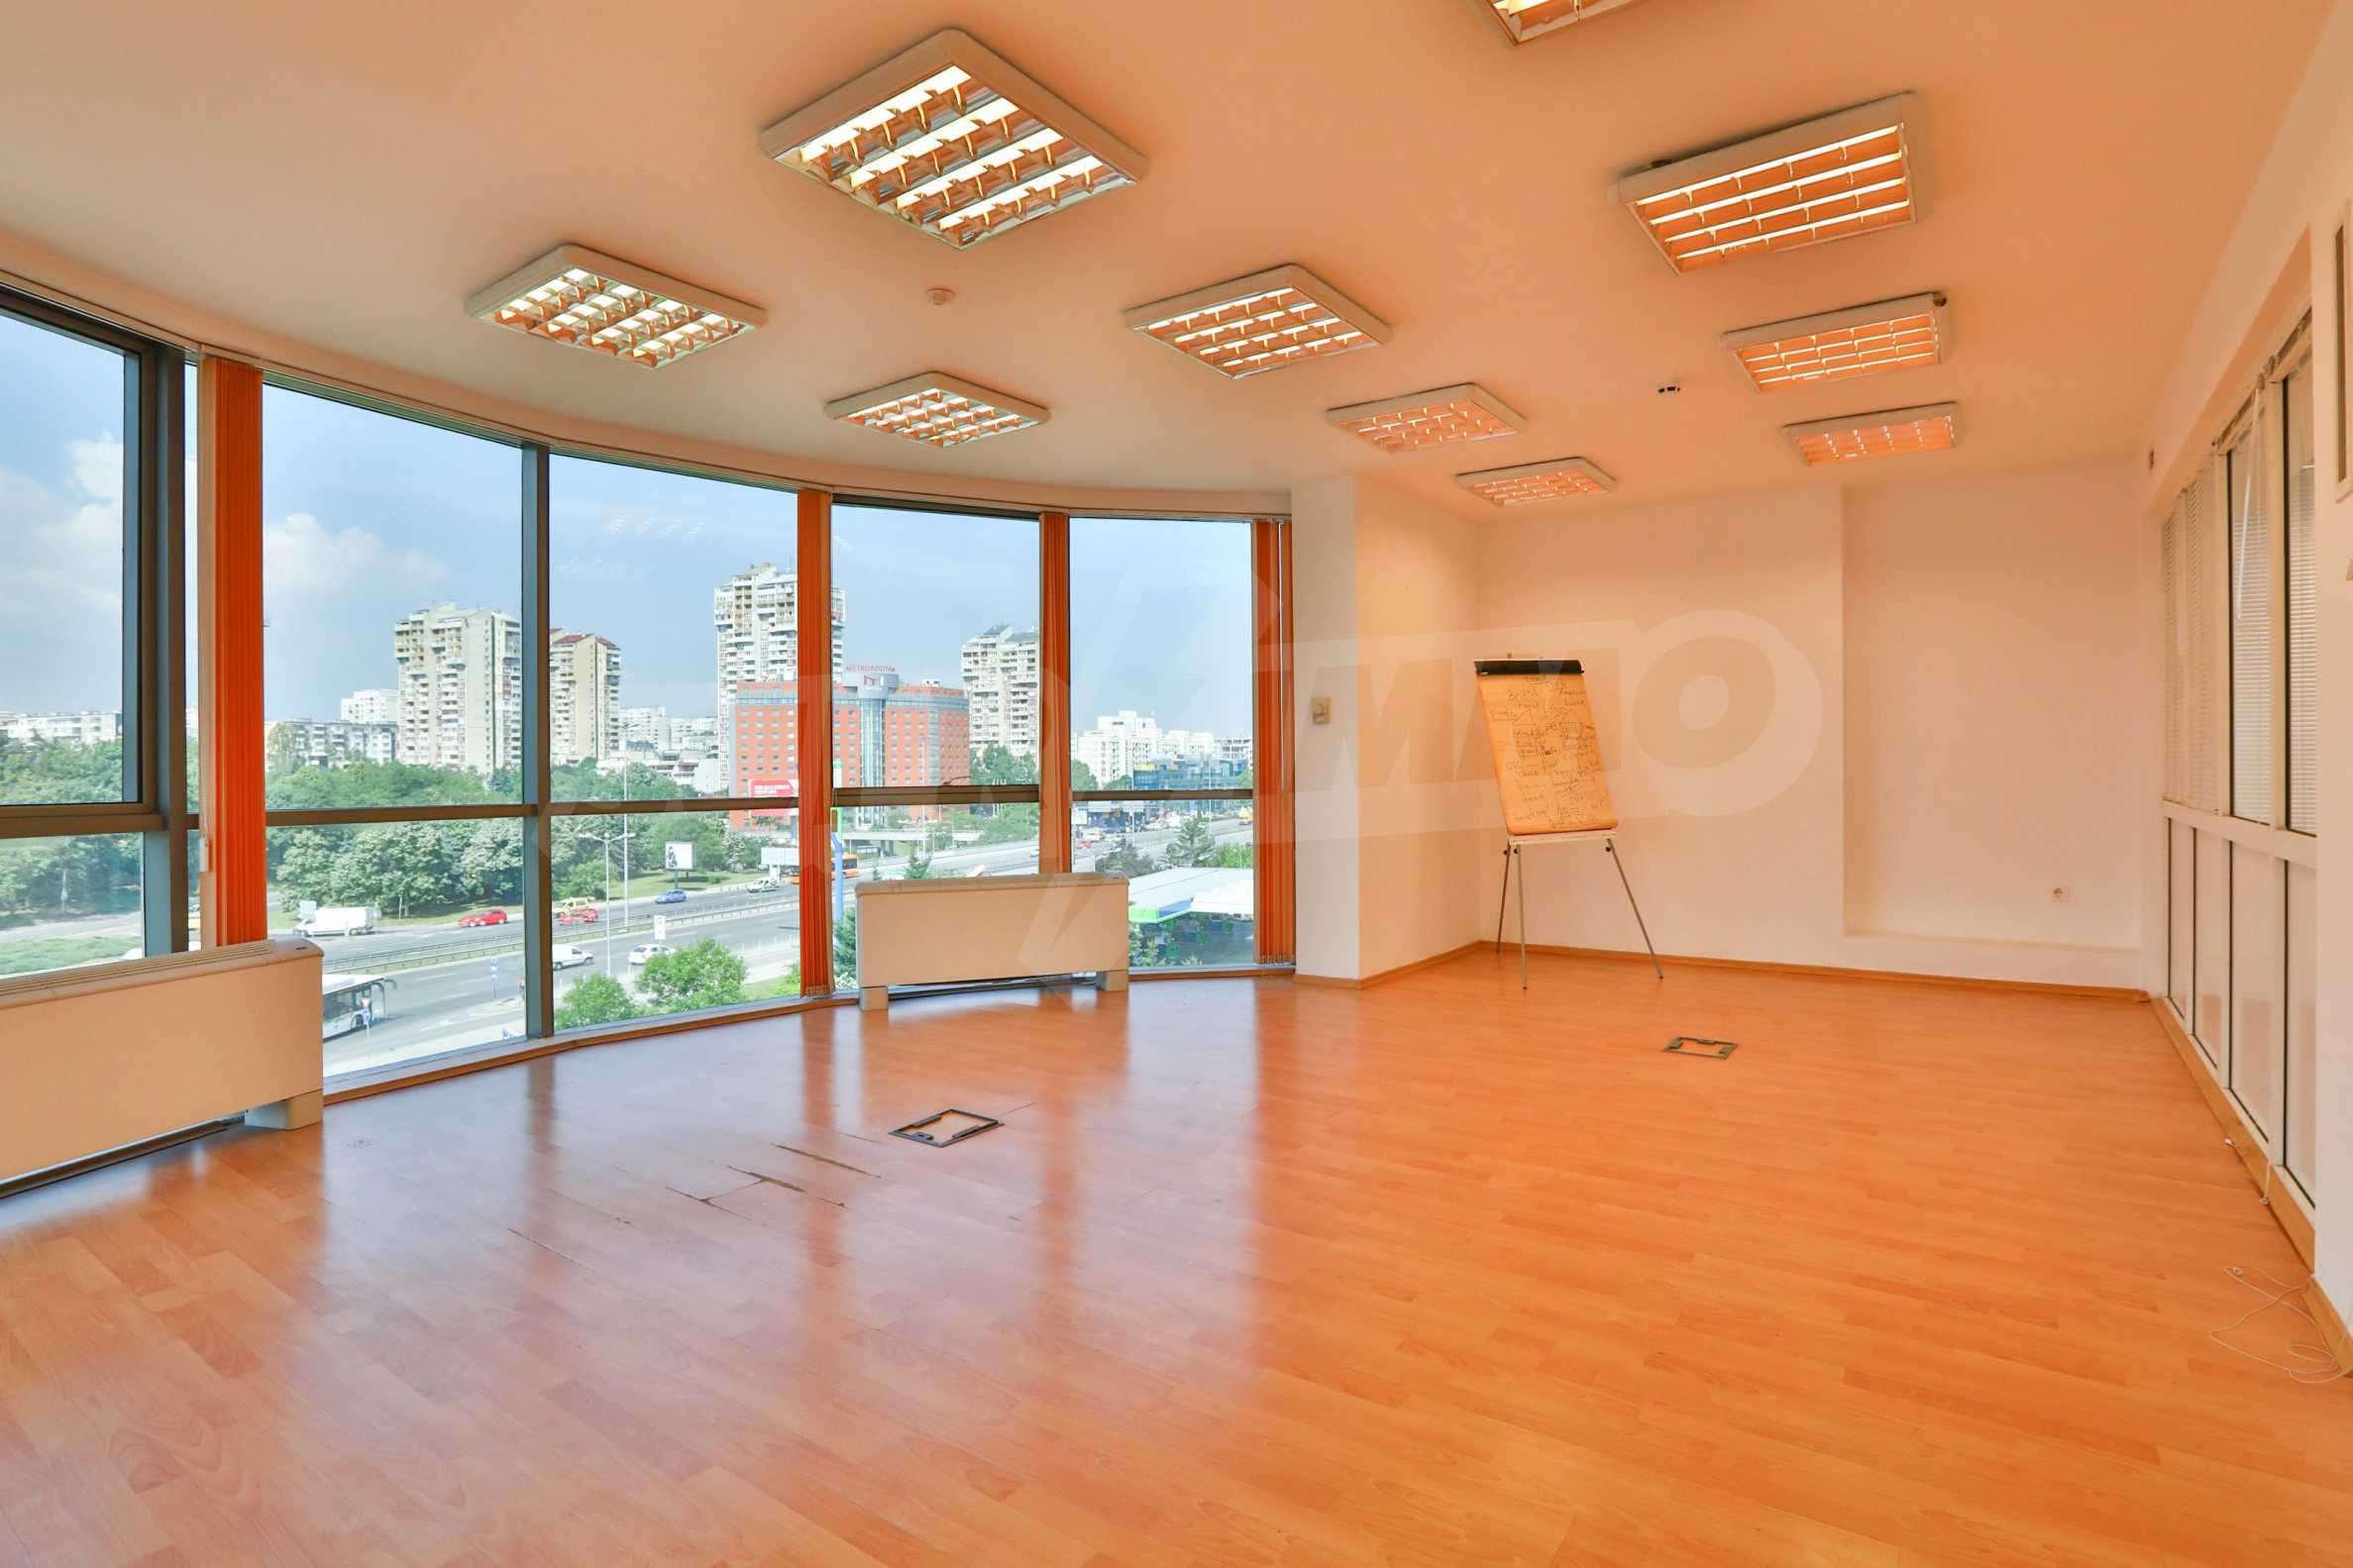 Офис в бизнес сграда висок клас на бул. Цариградско шосе 13